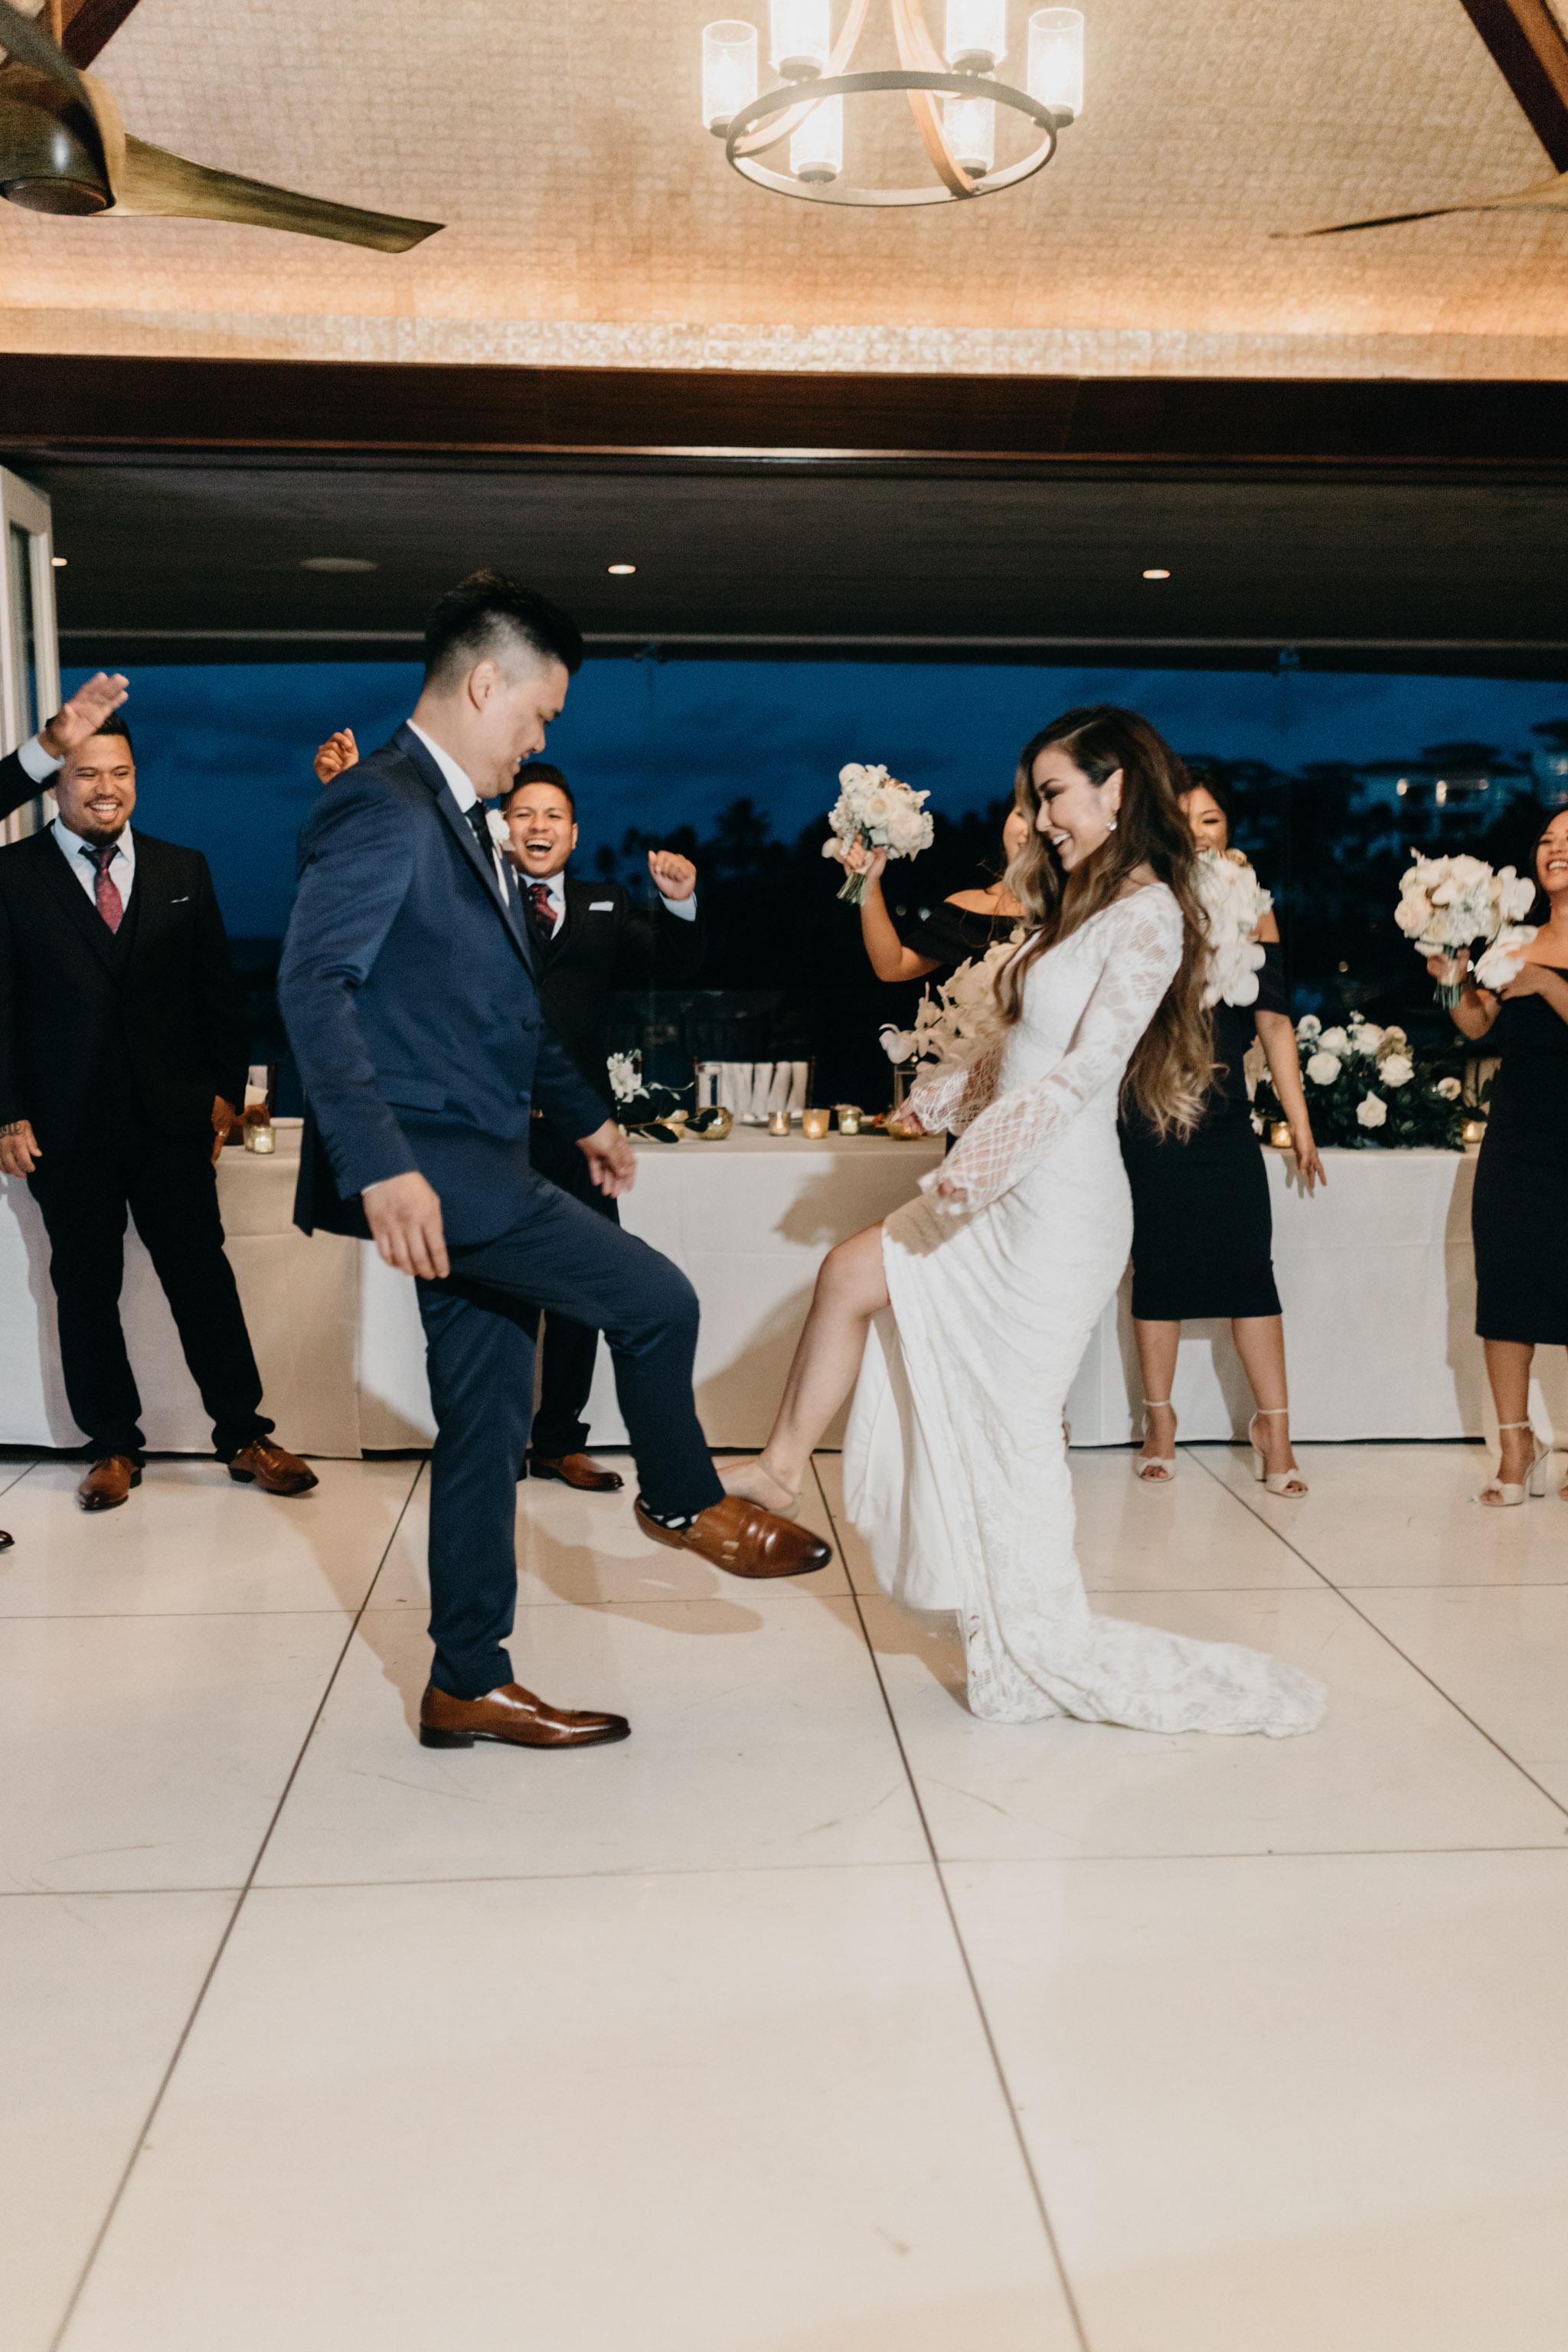 Bride and groom grand entrance   Merriman's Kapalua Maui wedding by Hawaii wedding photographer Desiree Leilani